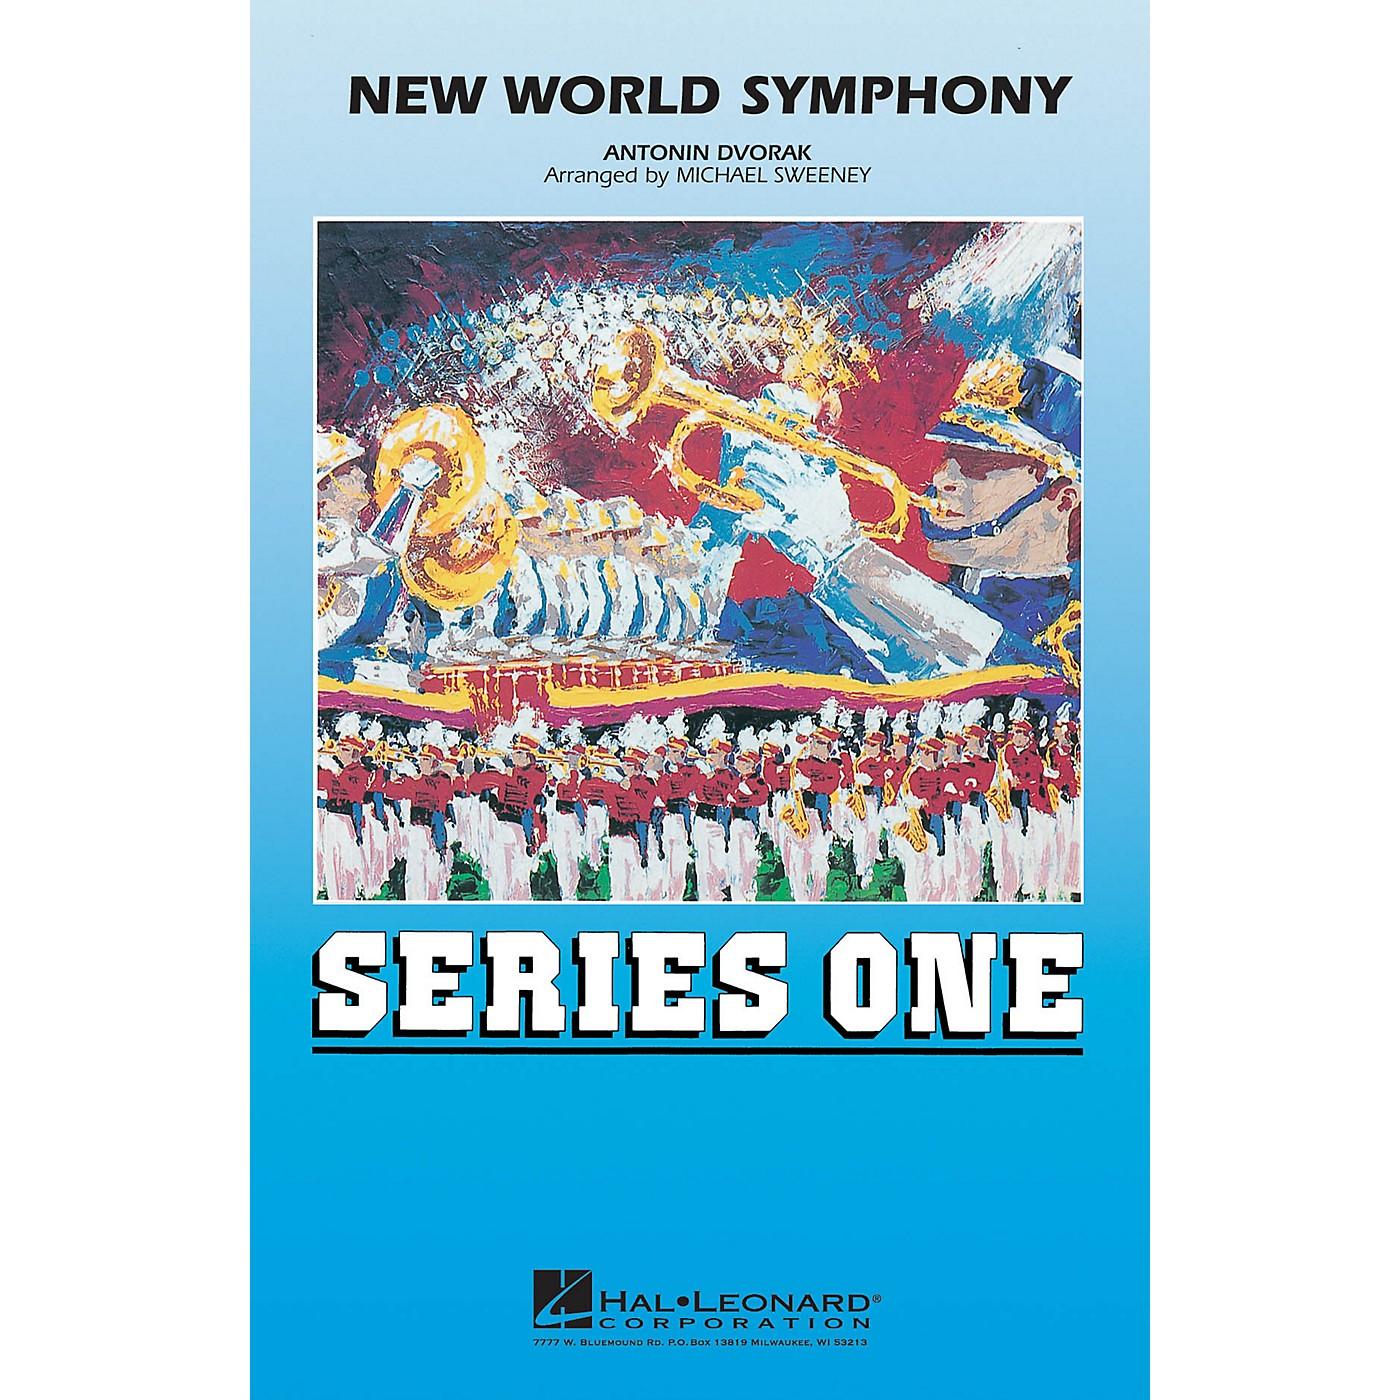 Hal Leonard New World Symphony Marching Band Level 2 Arranged by Michael Sweeney thumbnail